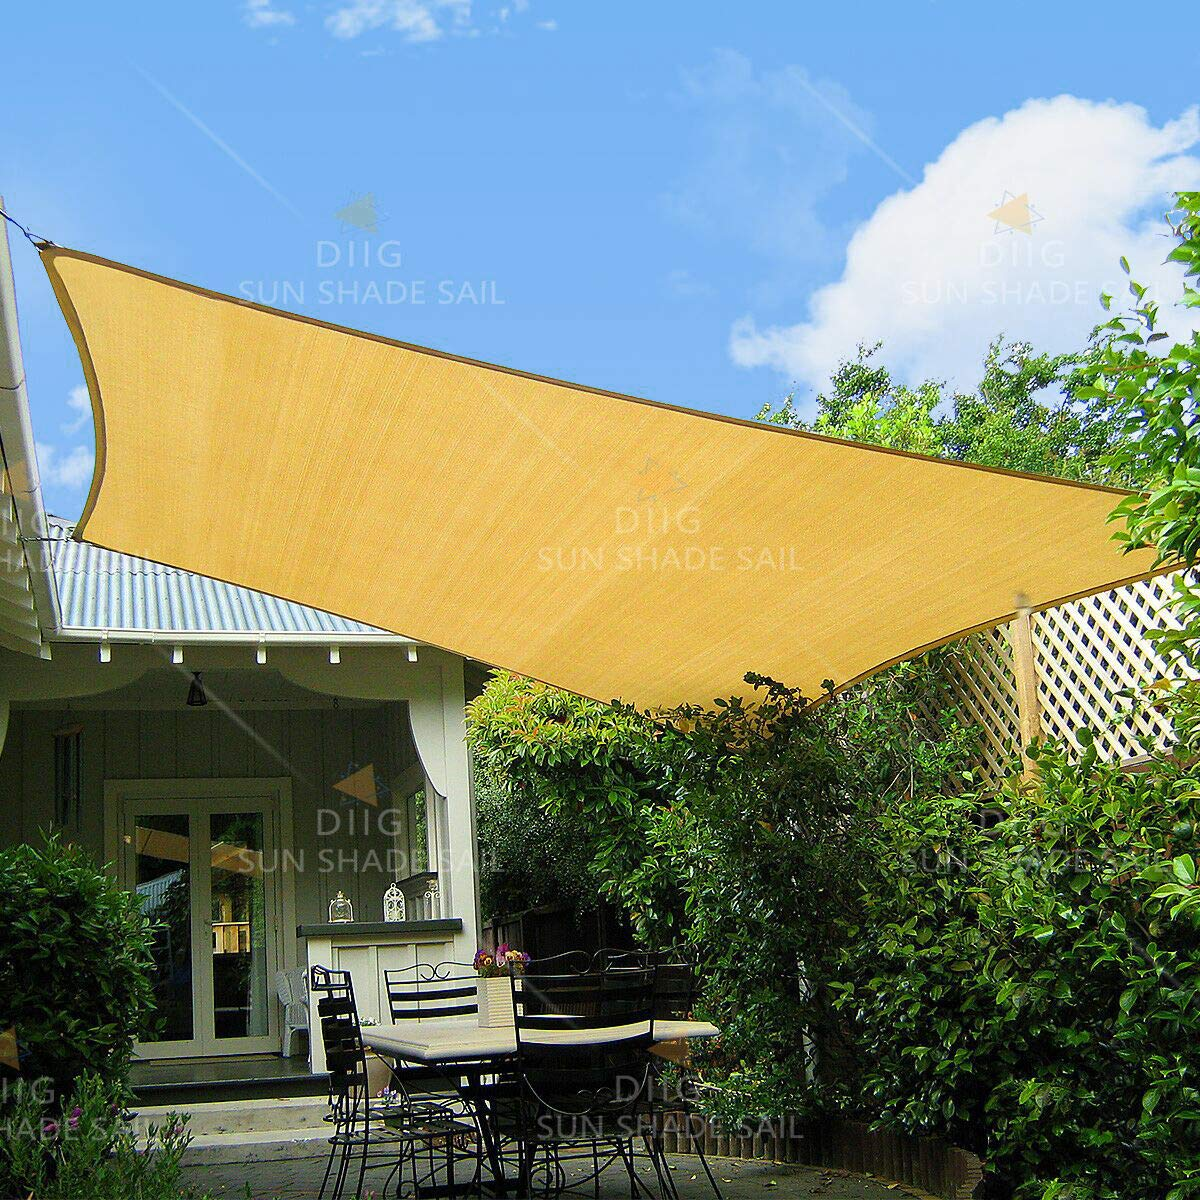 diig Patio Sun Shade Sail Canopy, 8 x 12 Rectangle Shade Cloth UV Block Sunshade Fabric – Outdoor Cover Awning Shelter for Pergola Backyard Garden Yard Sand Color